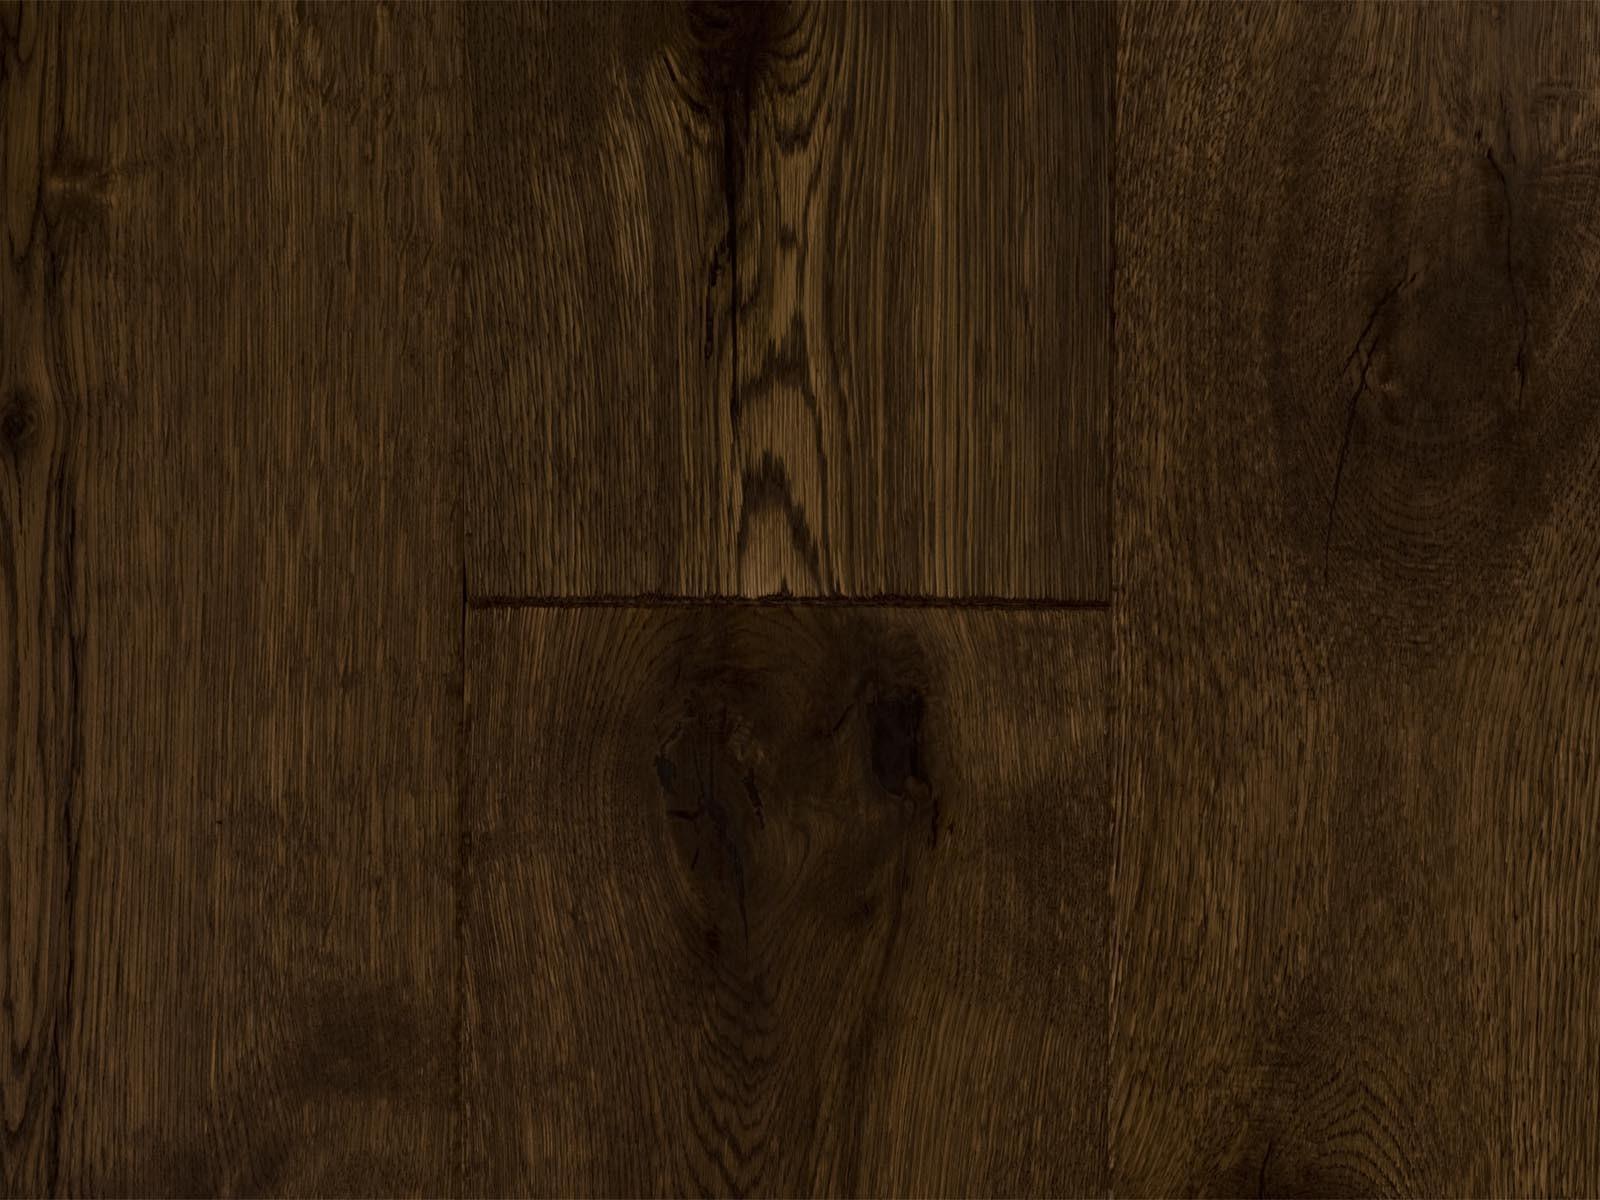 black walnut hardwood flooring for sale of duchateau hardwood flooring houston tx discount engineered wood in windsor european oak